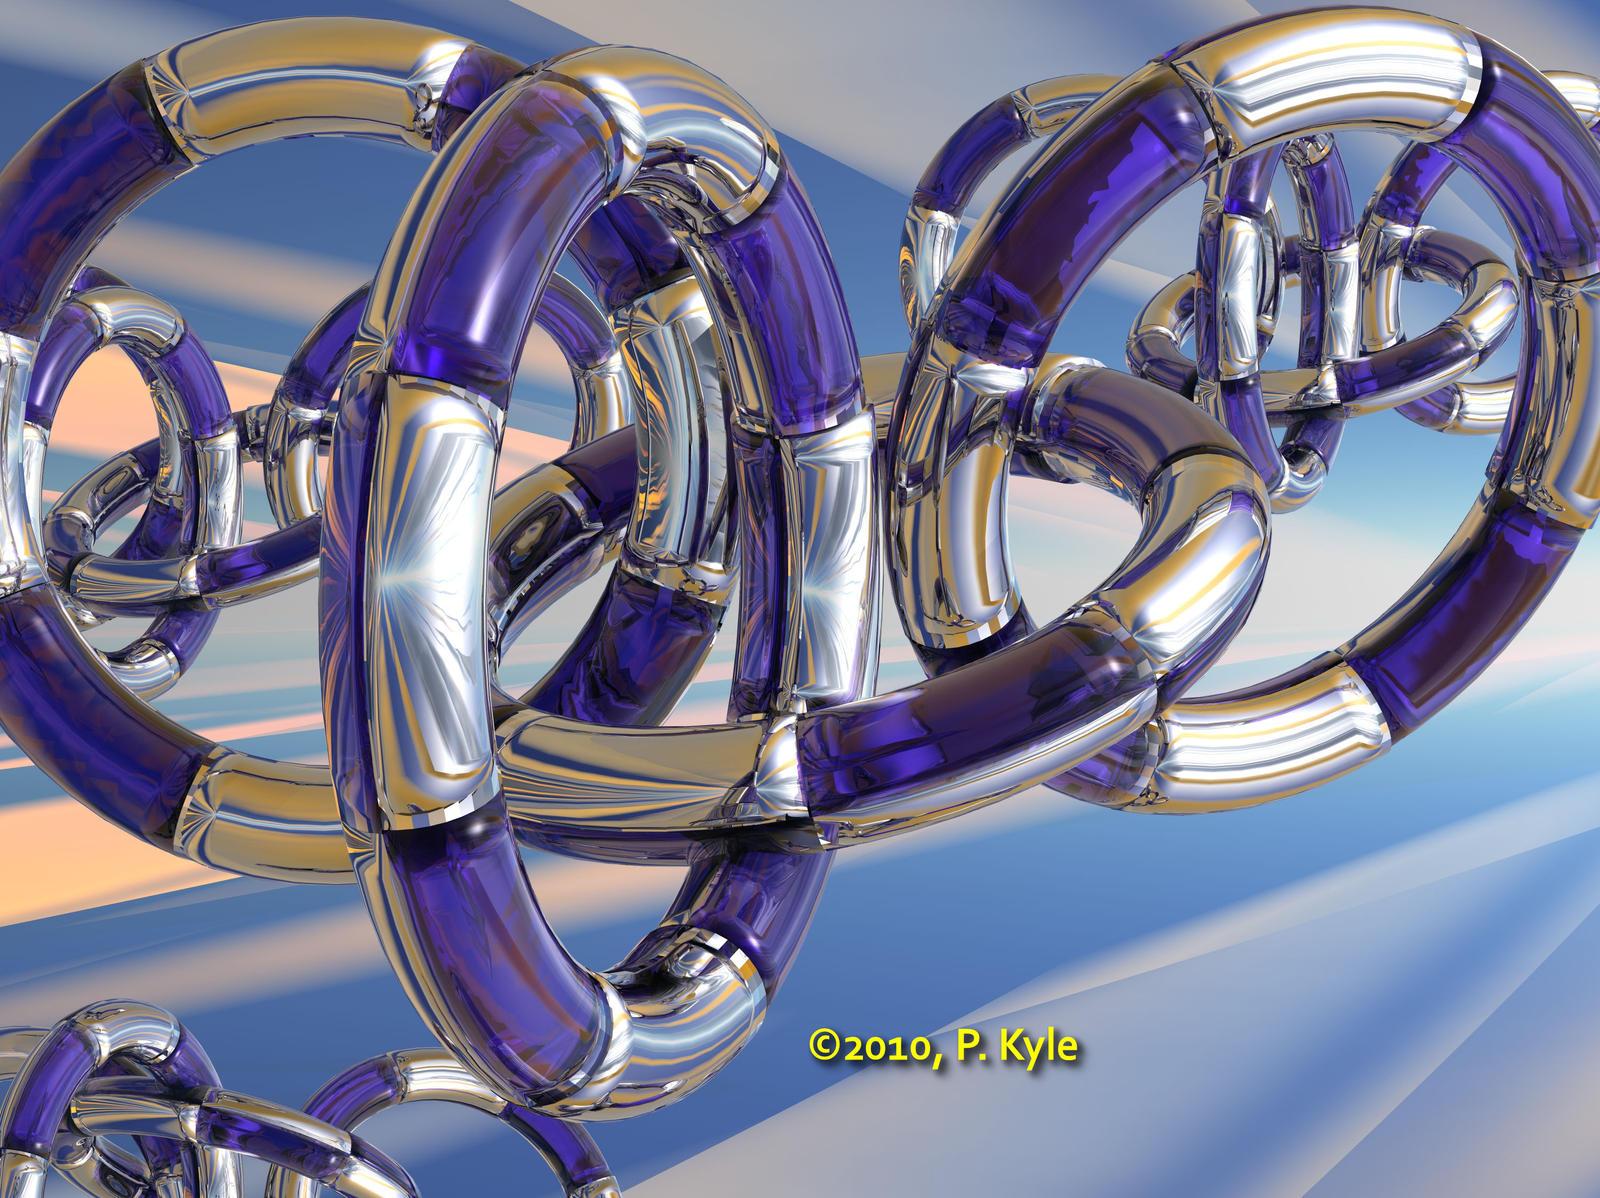 Circles by fractalyst